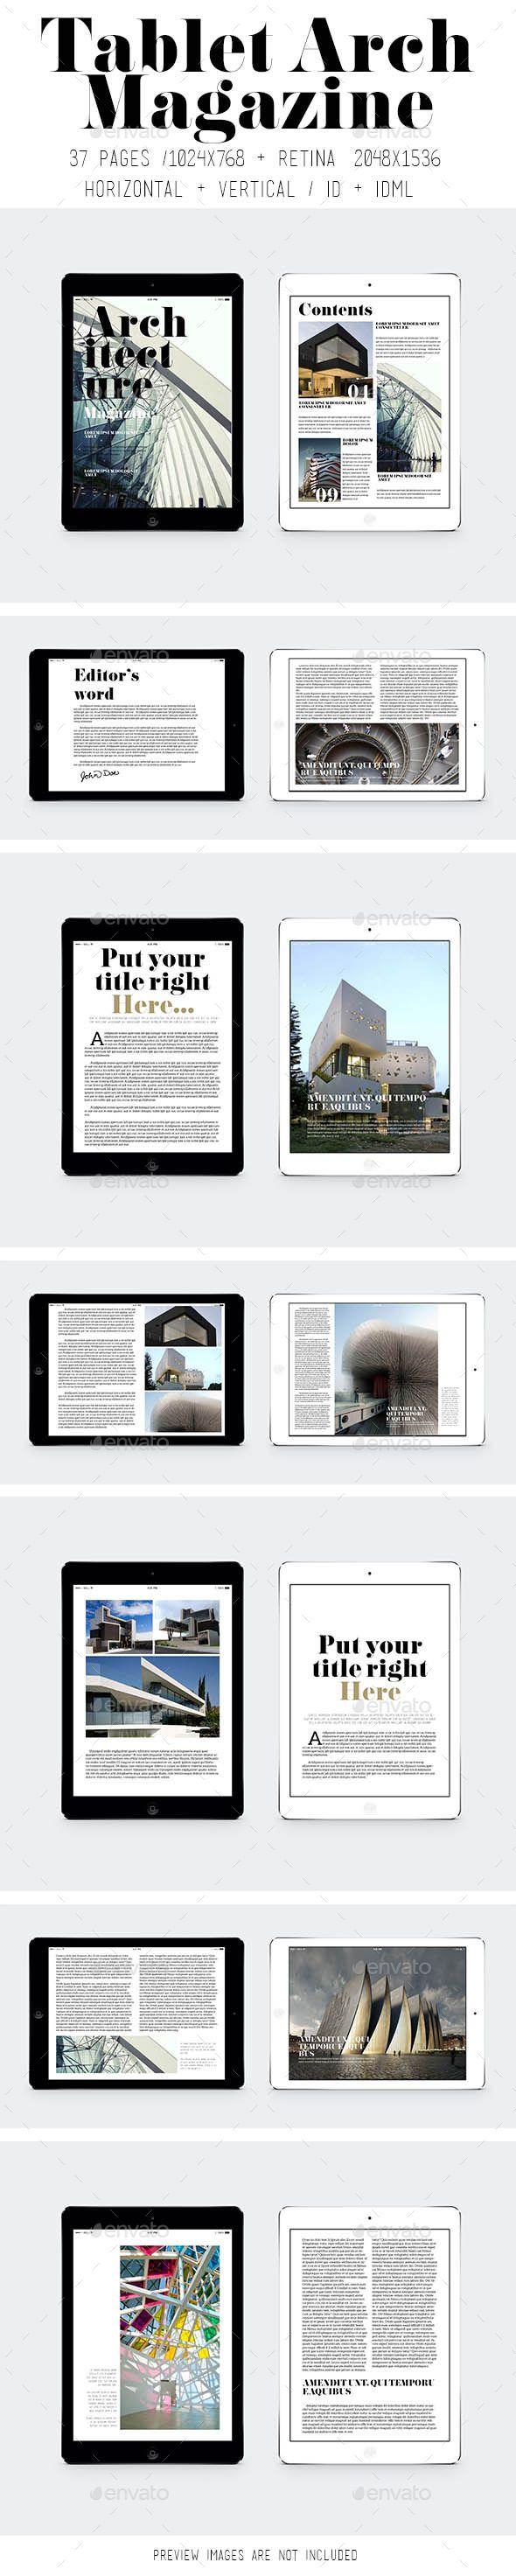 iPad & Tablet Arch Magazine Tempalte #design Download: http://graphicriver.net/item/ipad-tablet-arch-magazine/9191761?ref=ksioks